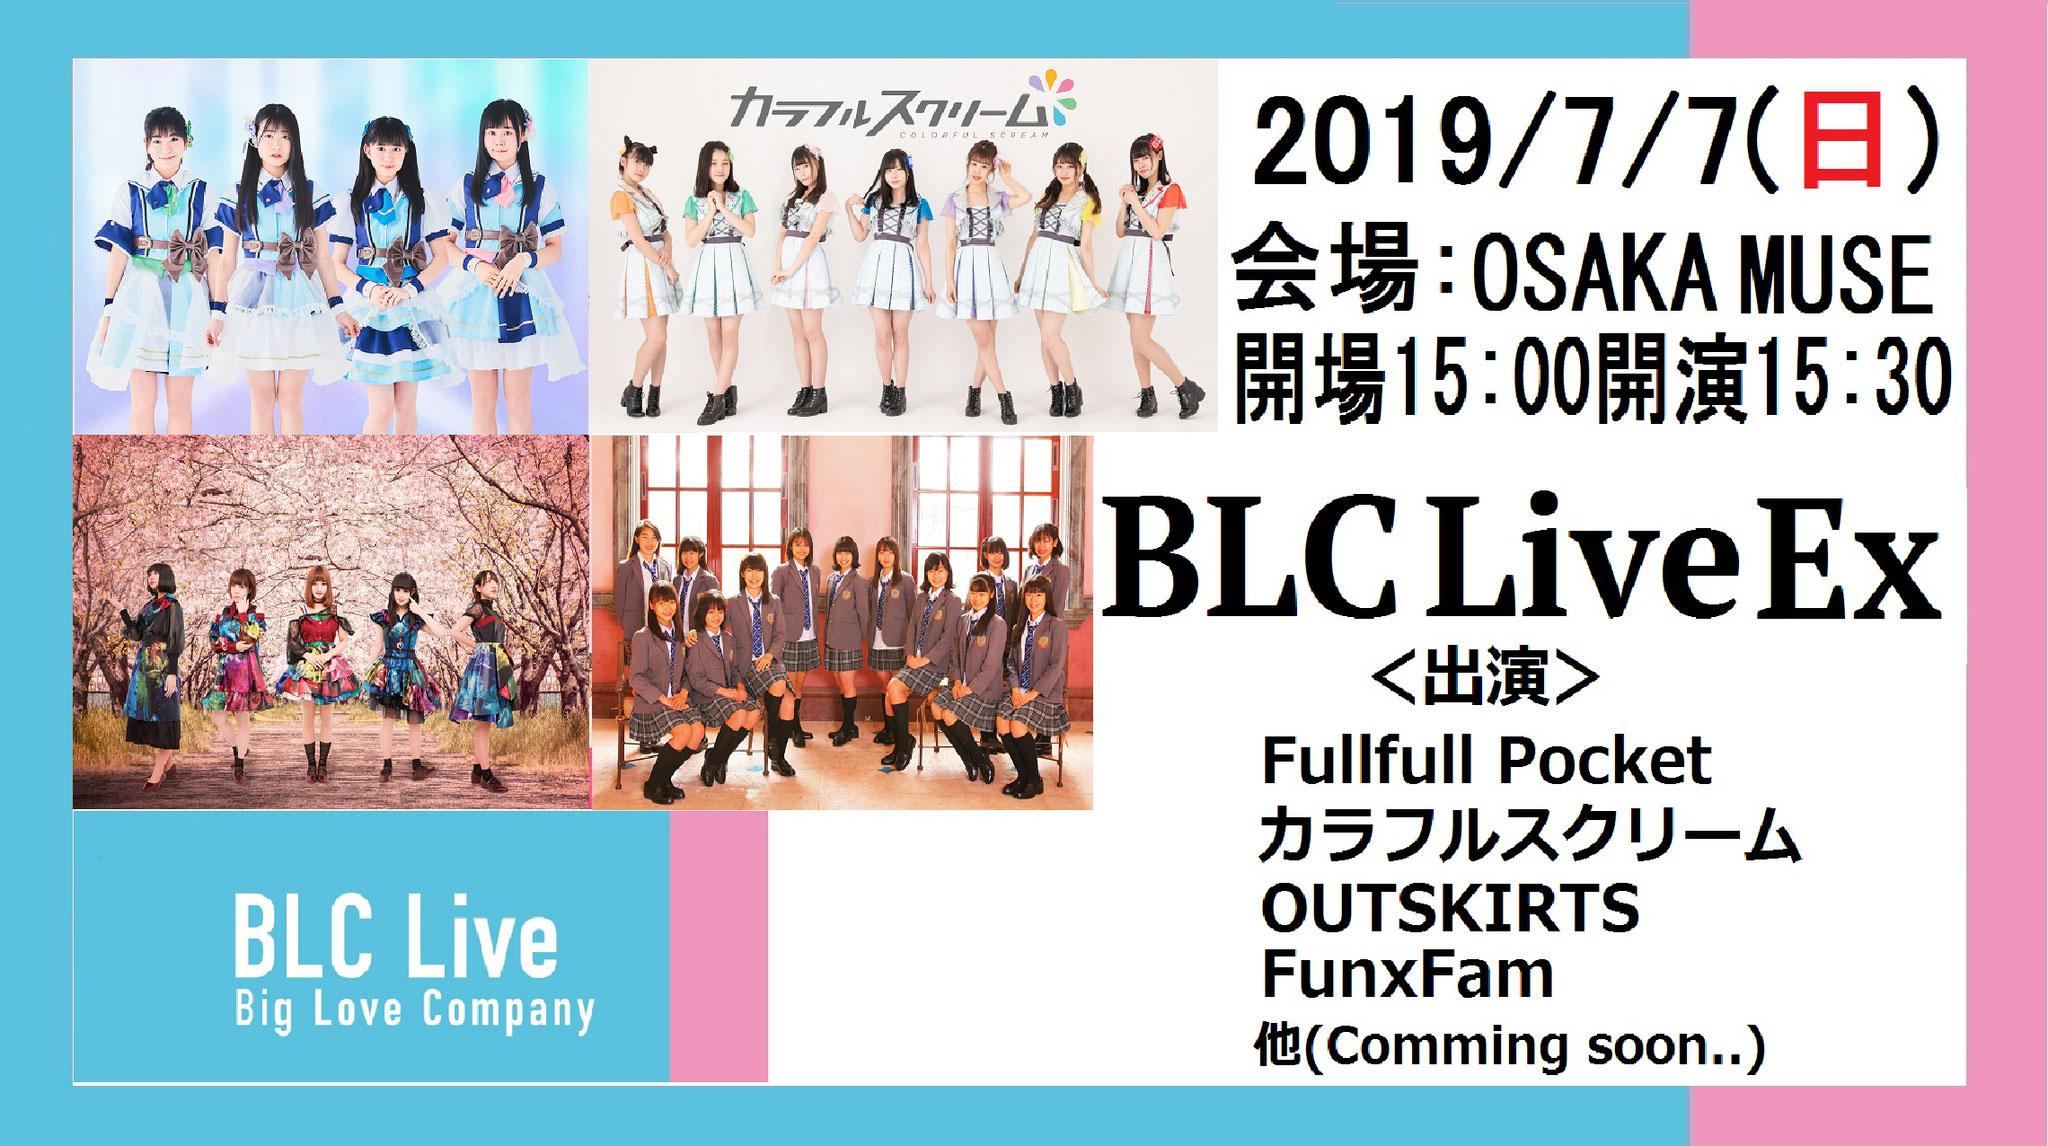 07/07(Sun) BLC Live Ex @ OSAKA MUSE